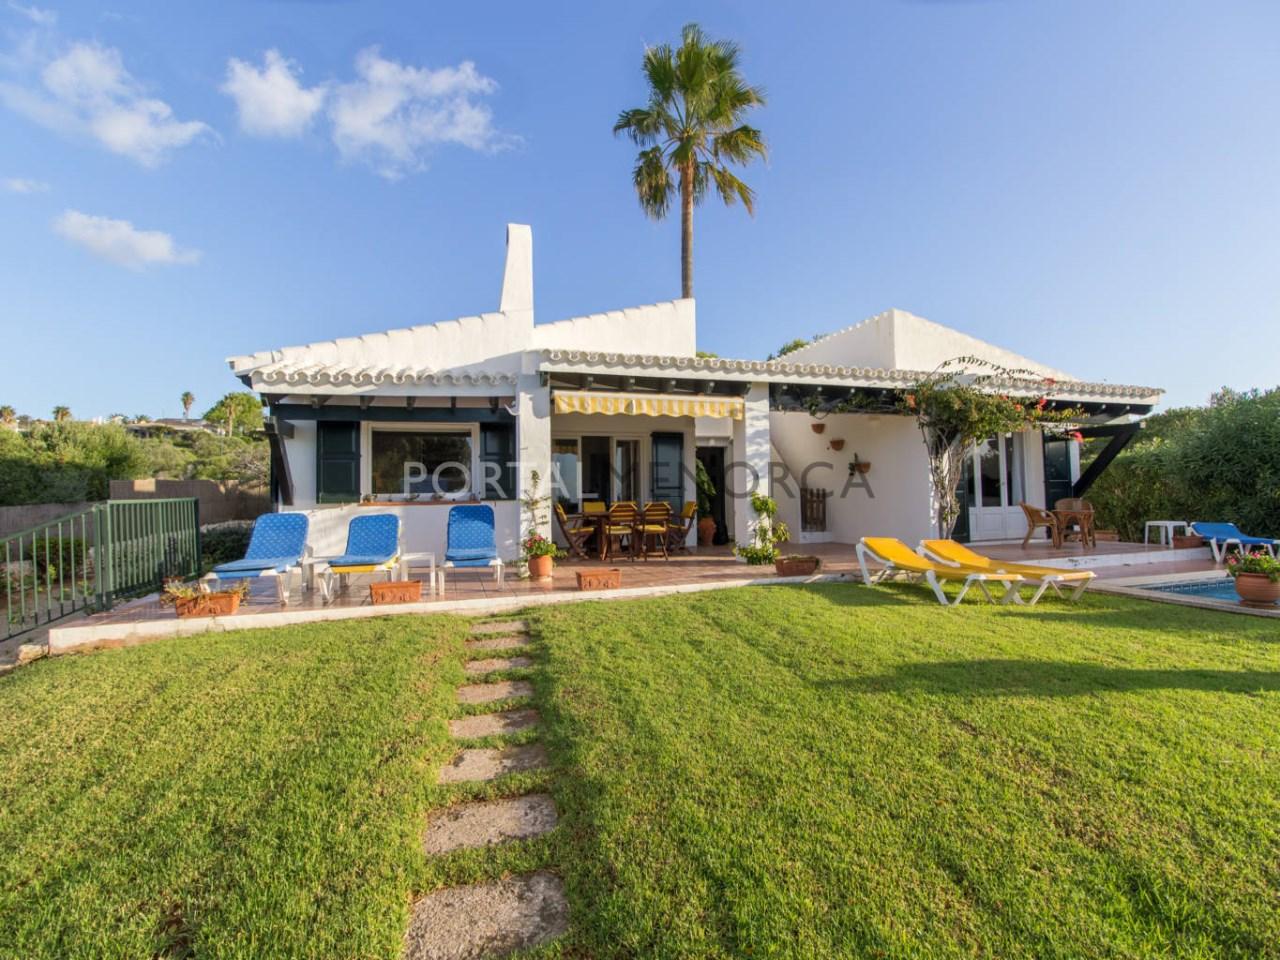 Villa avec vue mer en vente à Minorque